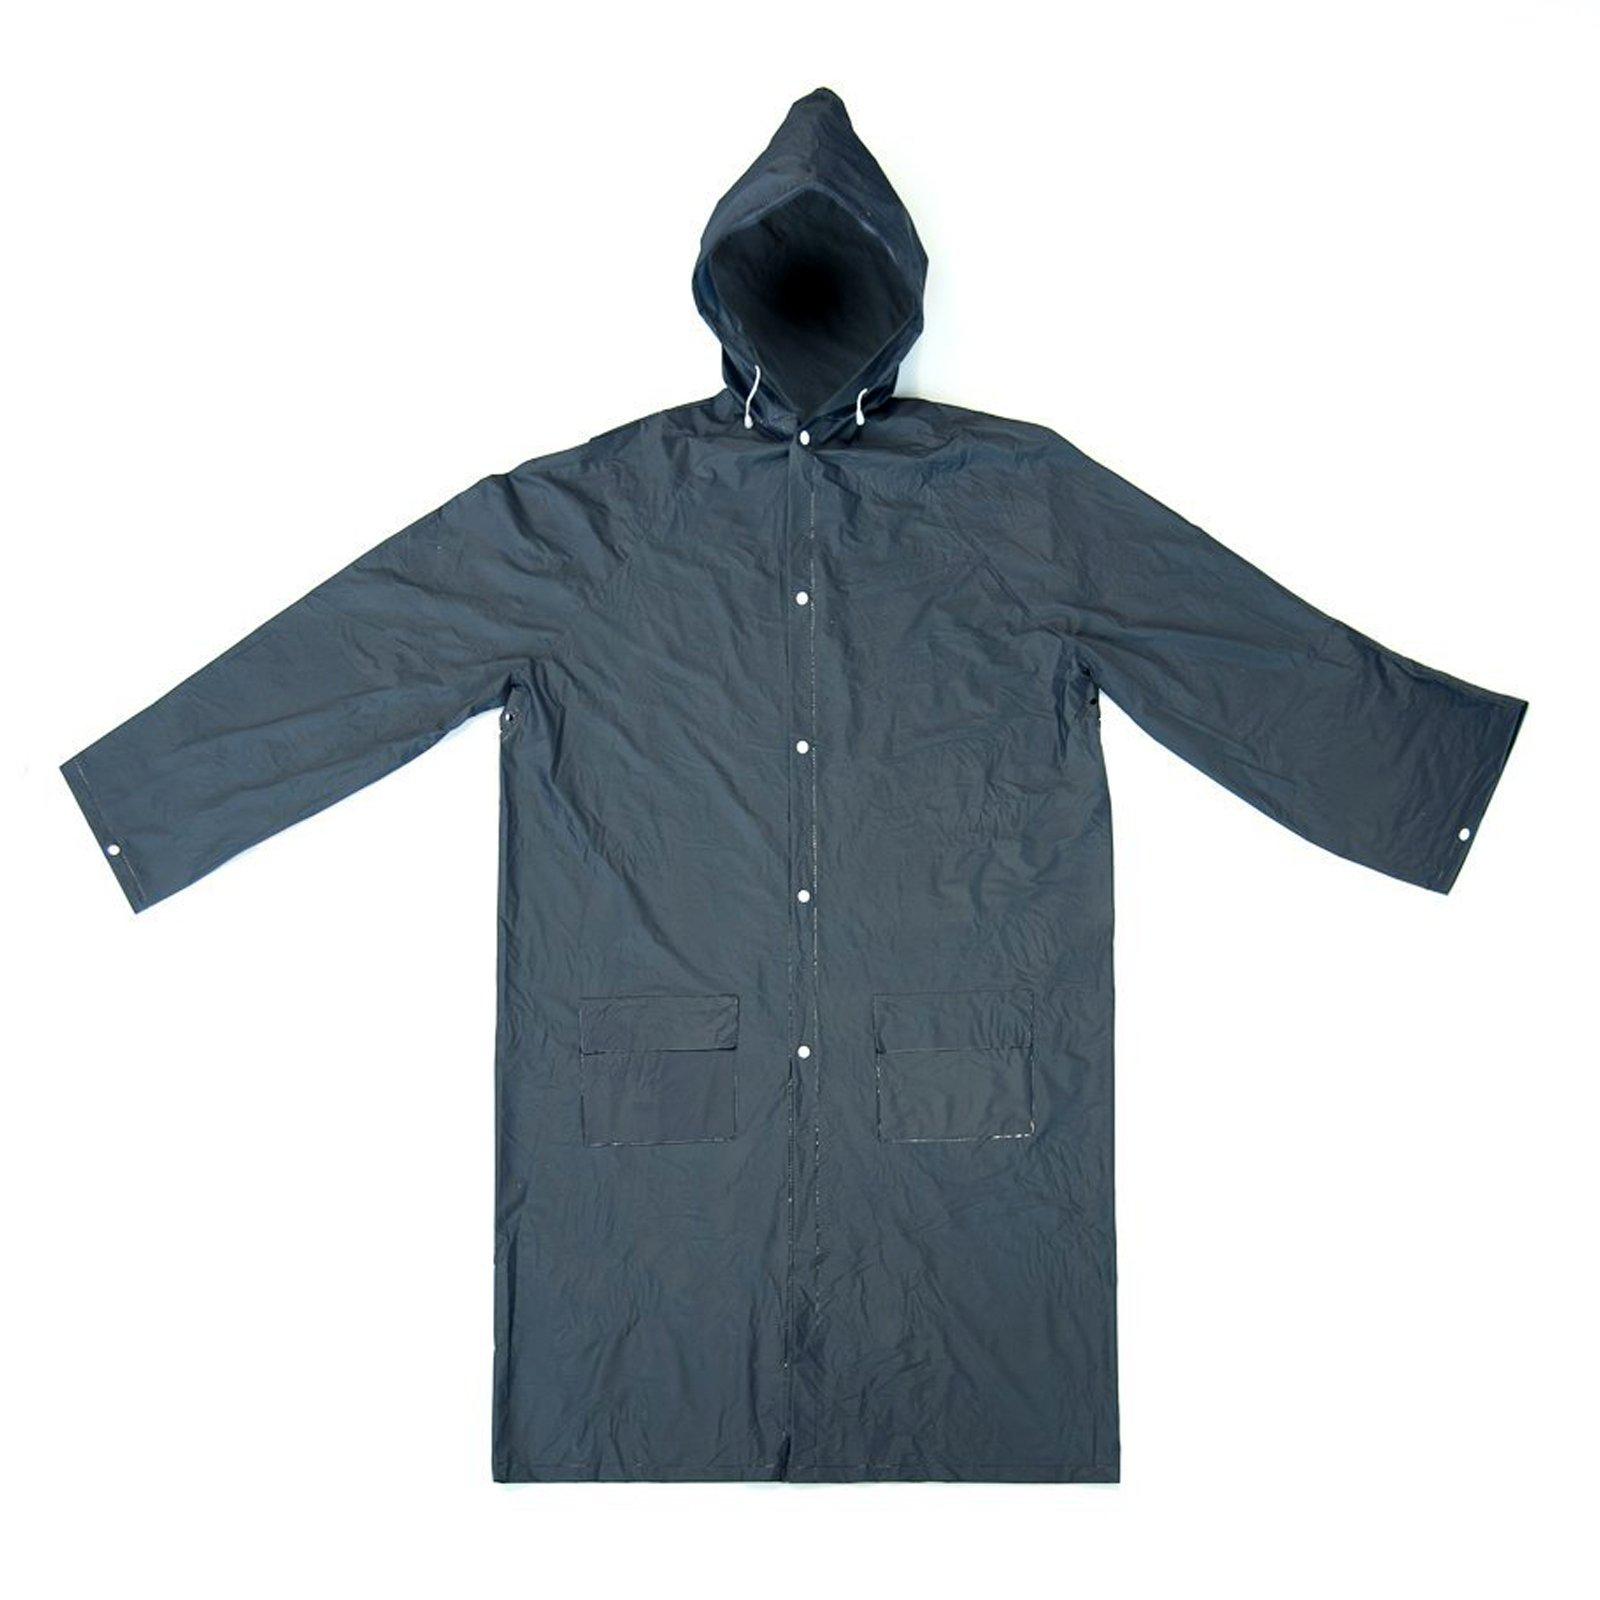 SE OD-RC784-XL Raincoat, Size M-XL, Navy Blue